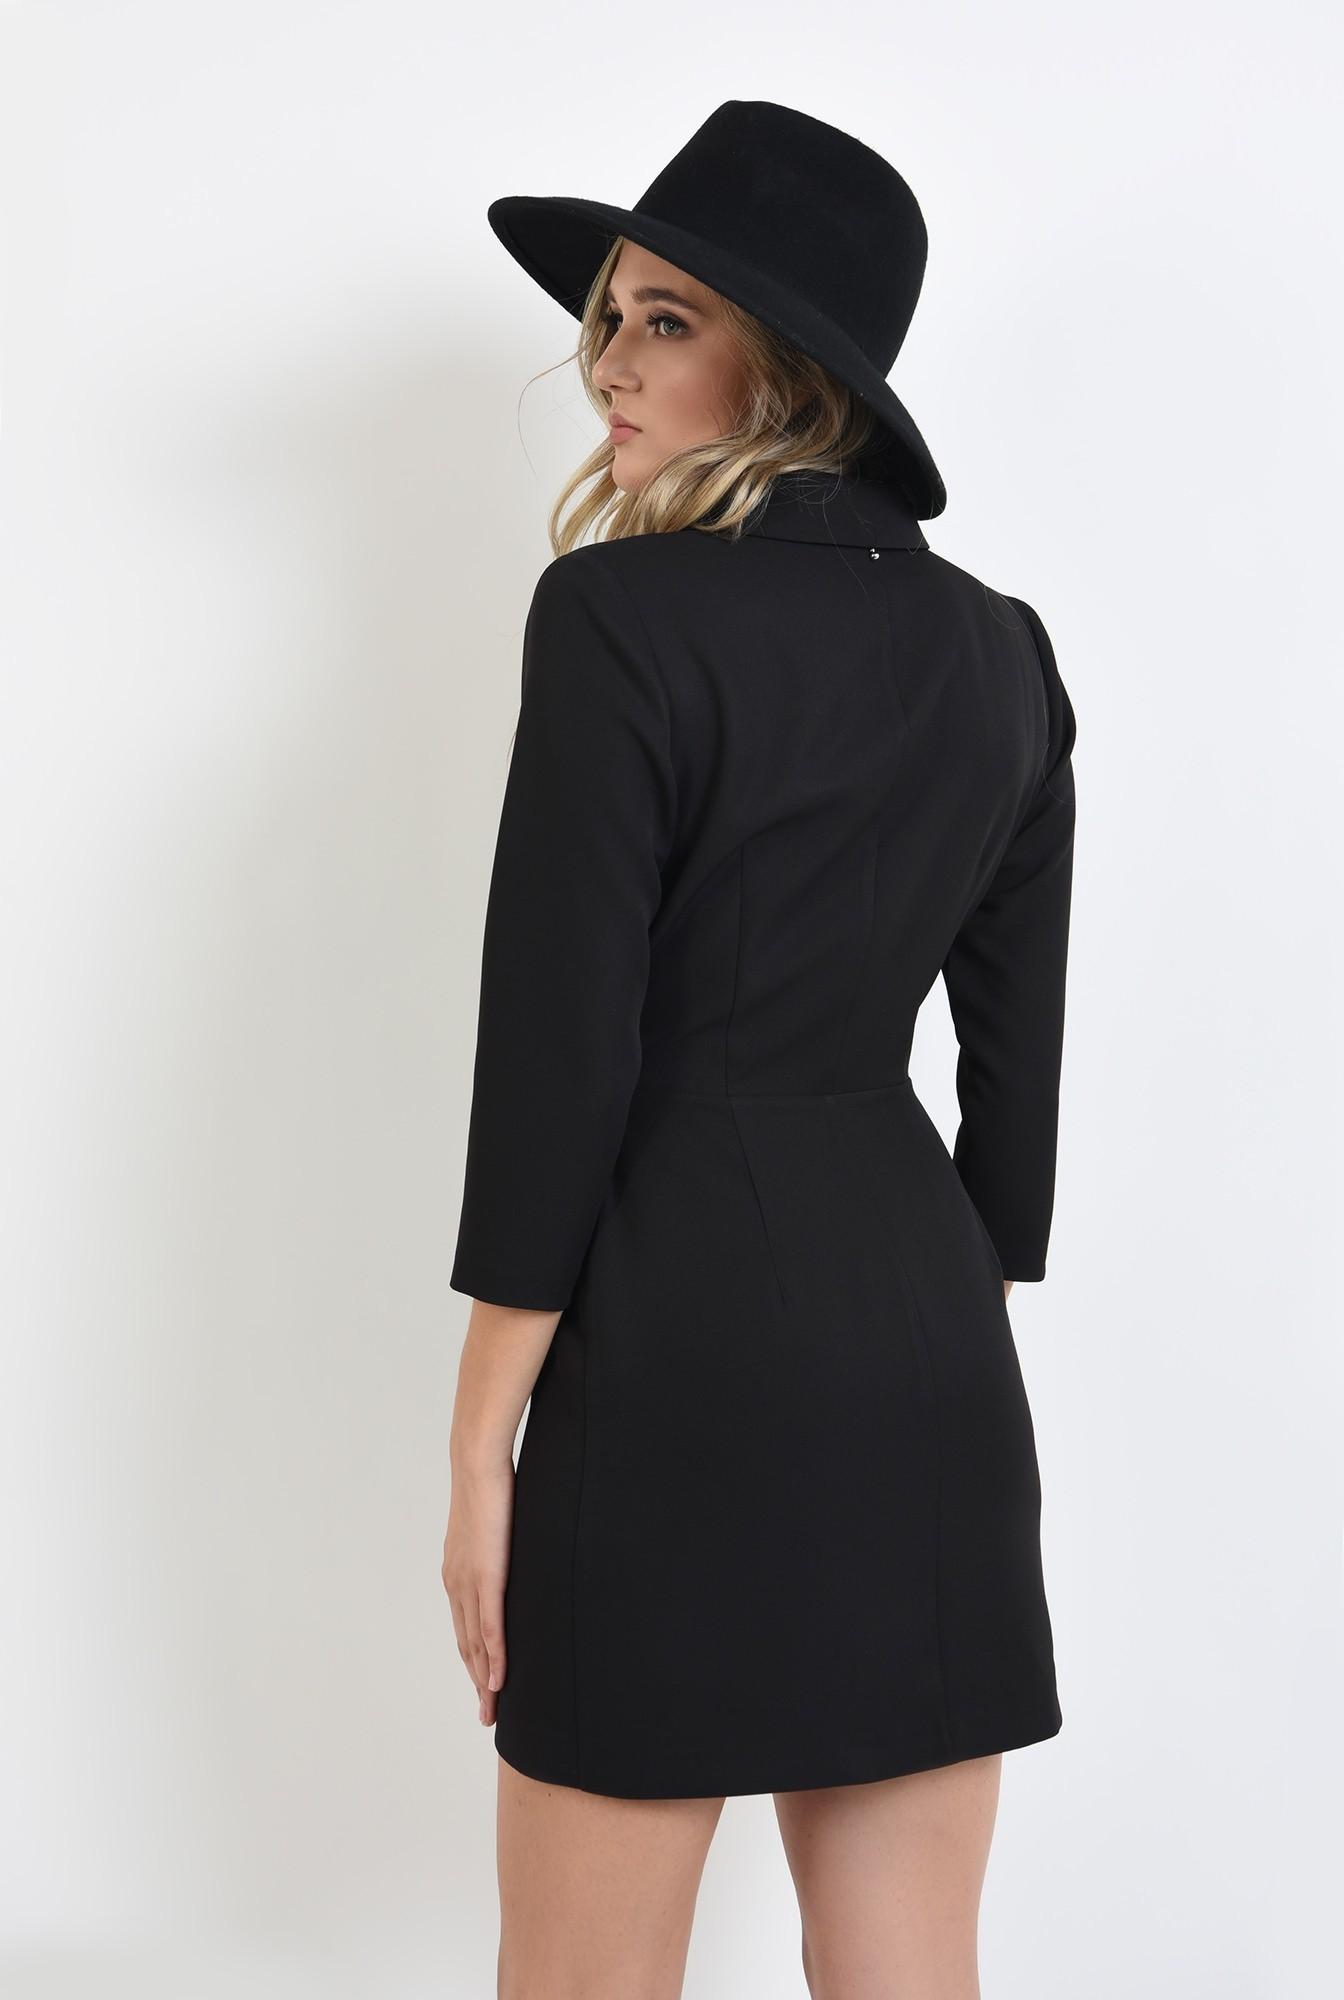 1 - rochie mini, neagra, tip sacou, cu nasturi argintii